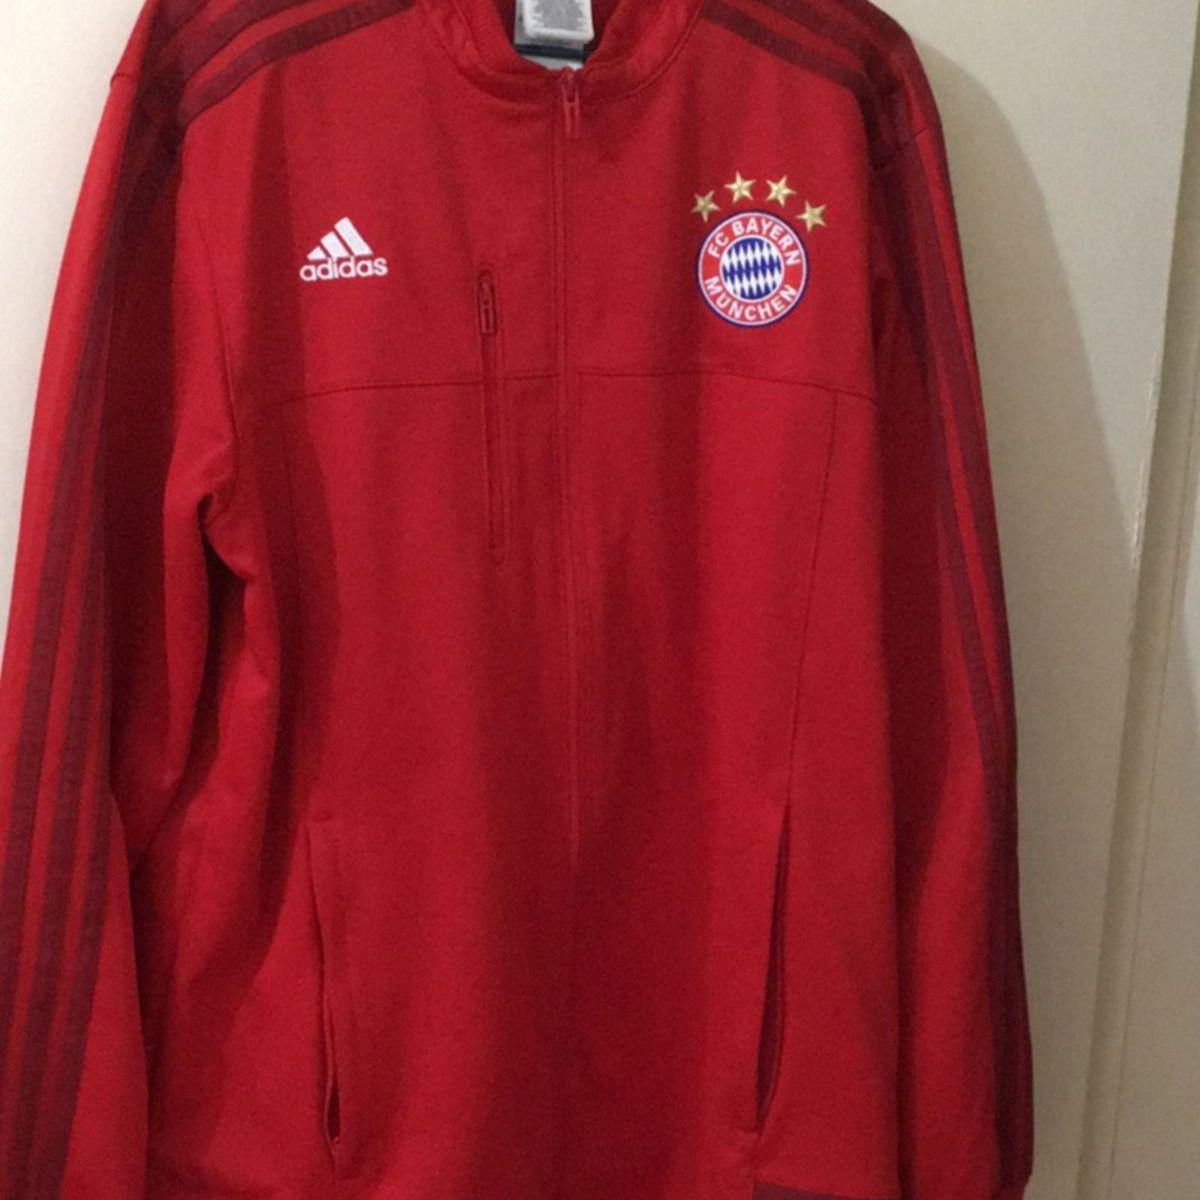 473d8861c5 Jaqueta Adidas Hino Bayern de Munique 2015 | Casaco Masculino Adidas Usado  24919171 | enjoei